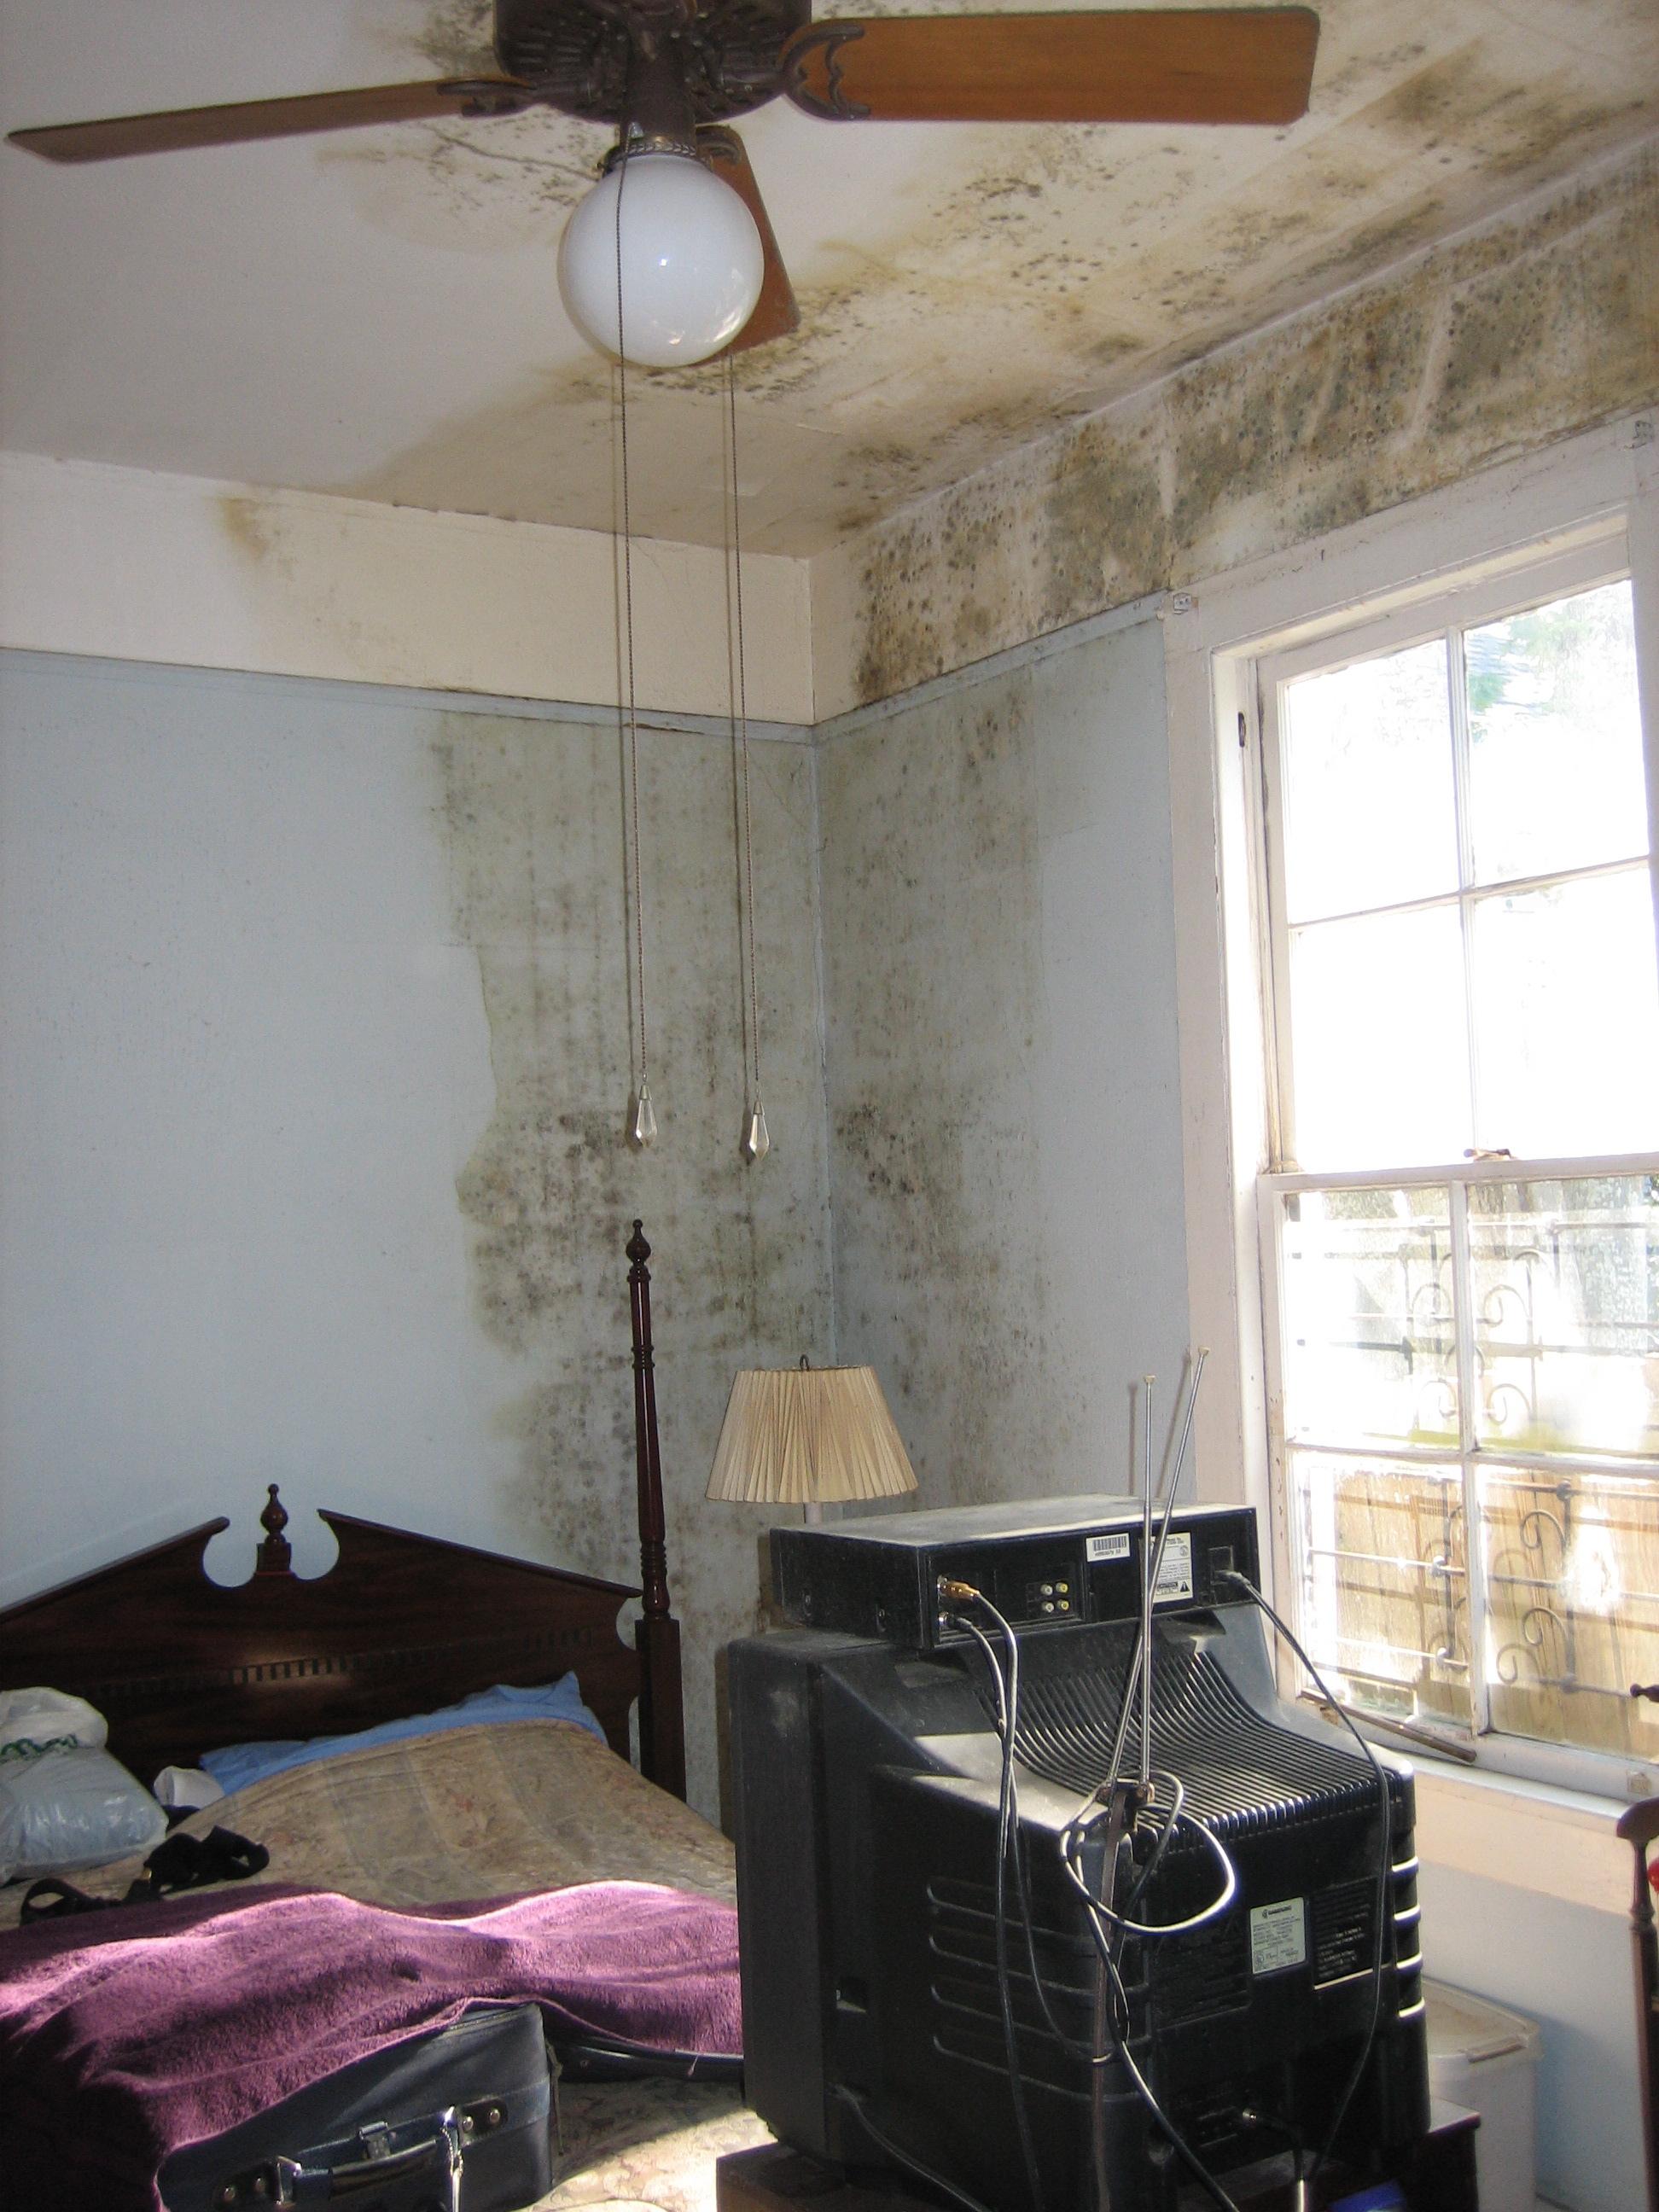 Kamar tidur berjamur dan lembap